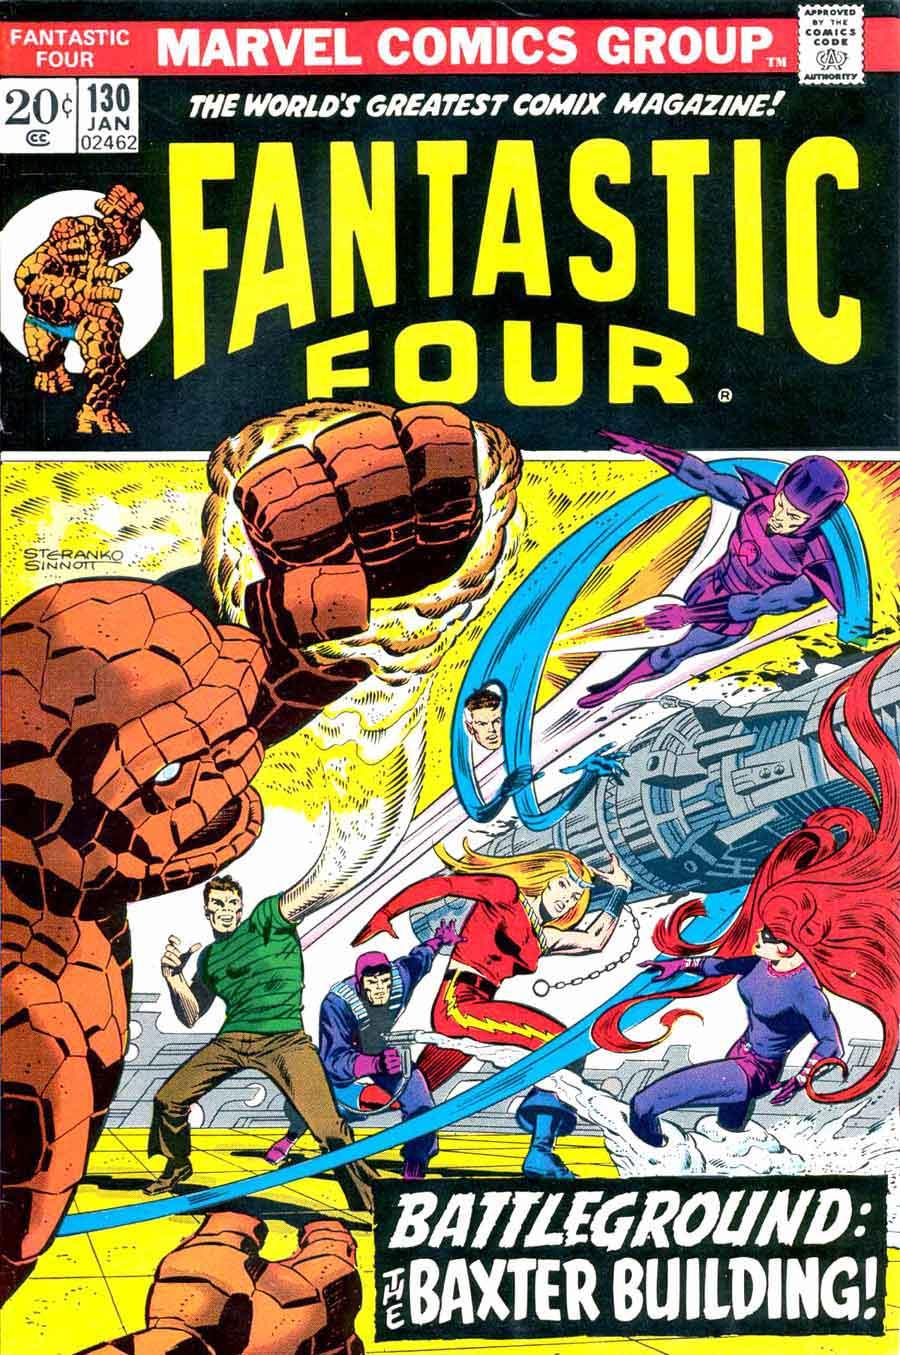 fantastic four   jim steranko cover  pencil ink - fantastc four v  marvel comic book cover art by jim steranko